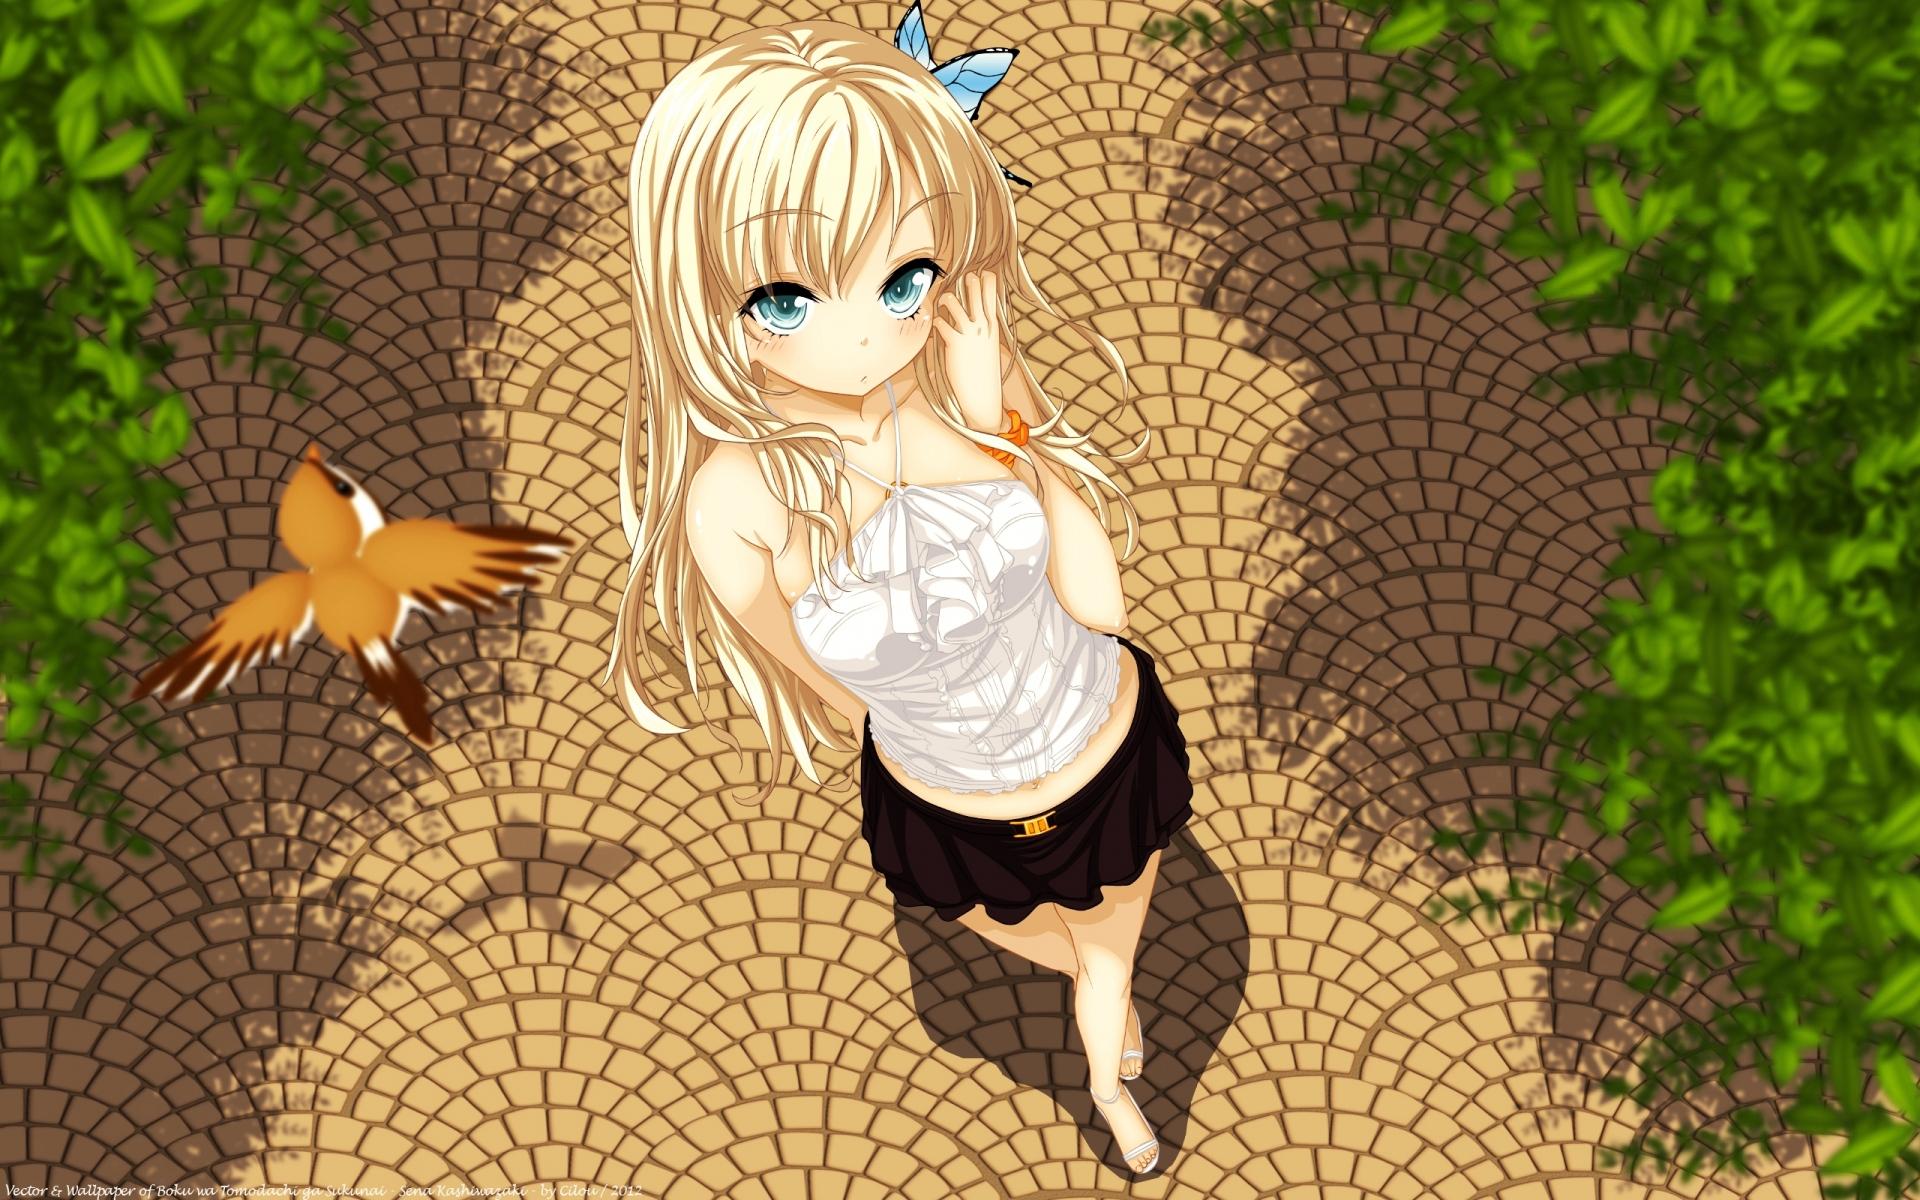 Картинки Buriki, boku wa tomodachi ga sukunai, kashiwazaki sena, девушка, блондинка, птица, муха фото и обои на рабочий стол